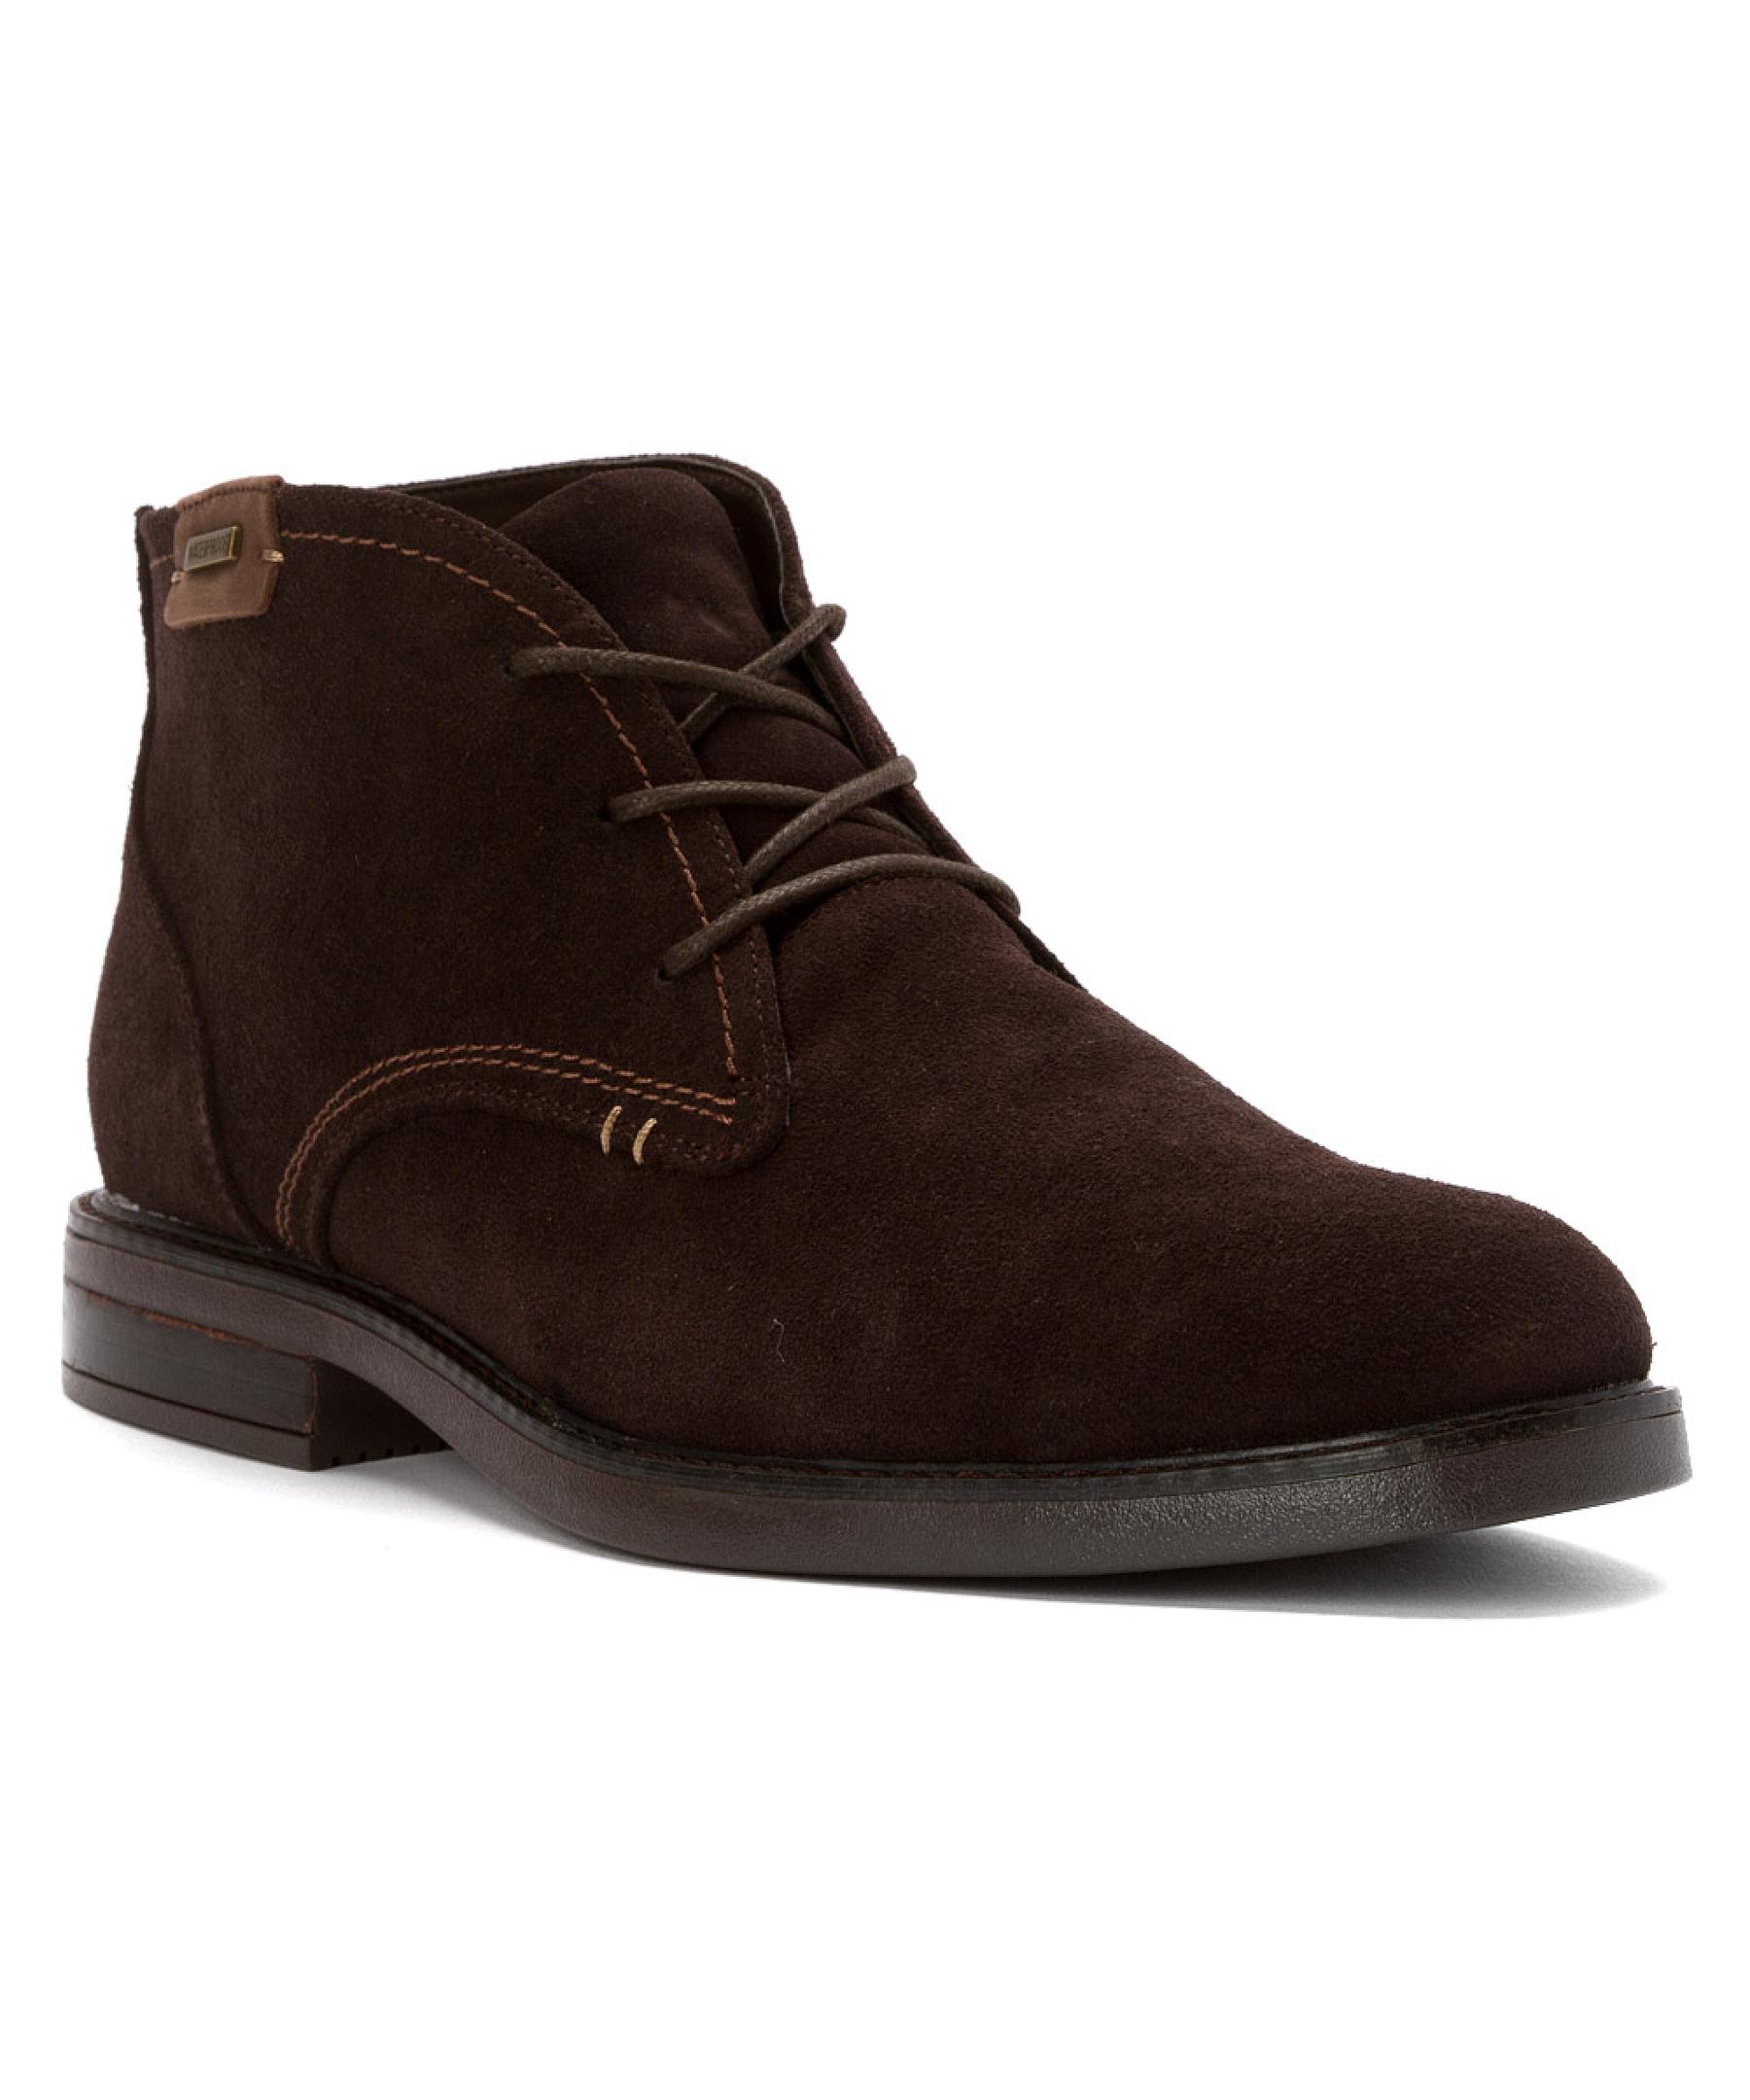 Boots Designer Shoes